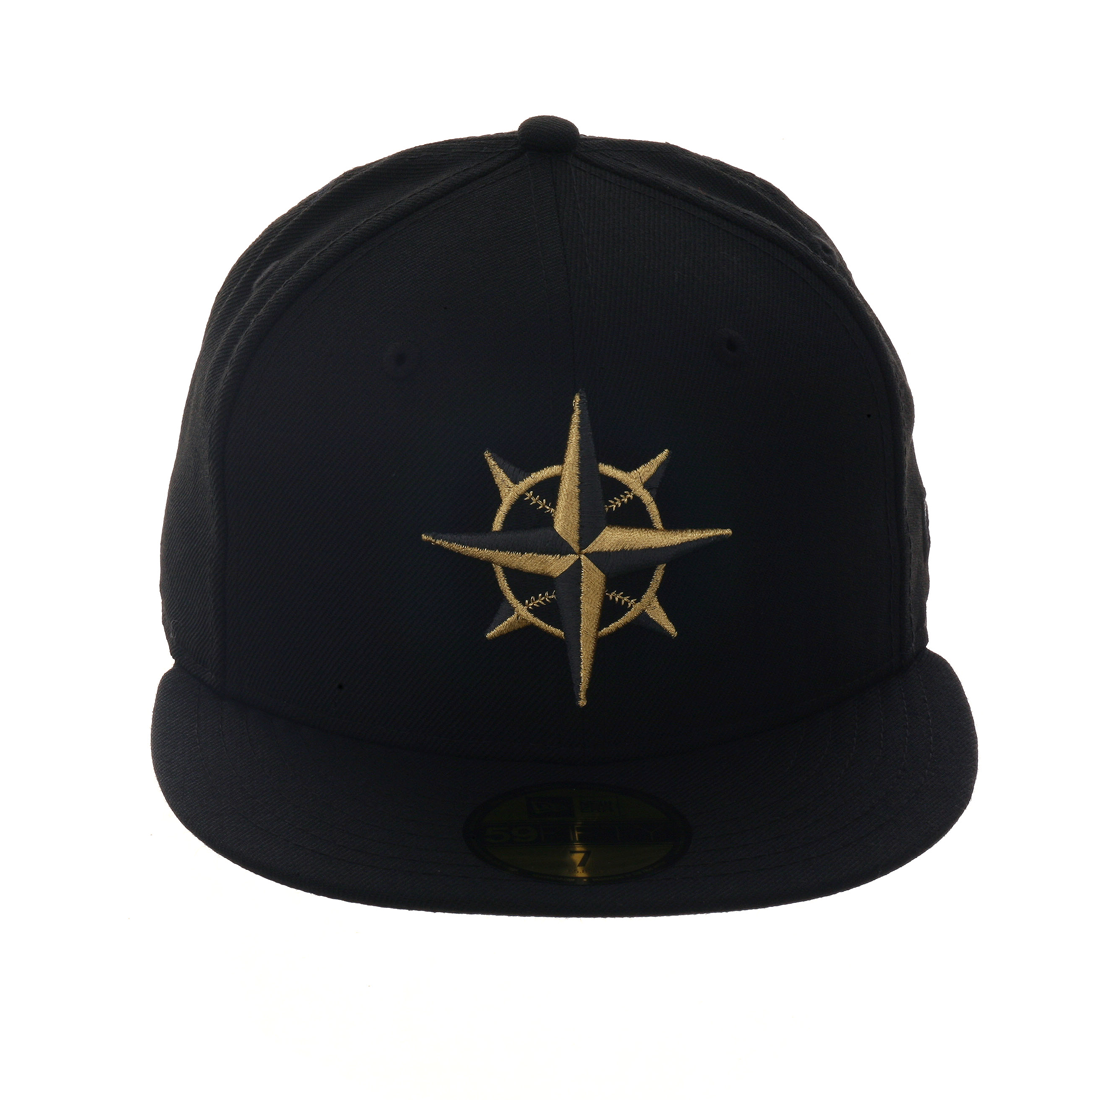 uk availability ecc5a f2e09 Exclusive New Era 59Fifty Seattle Mariners Hat - Black, Black, Metallic  Gold,   40.00